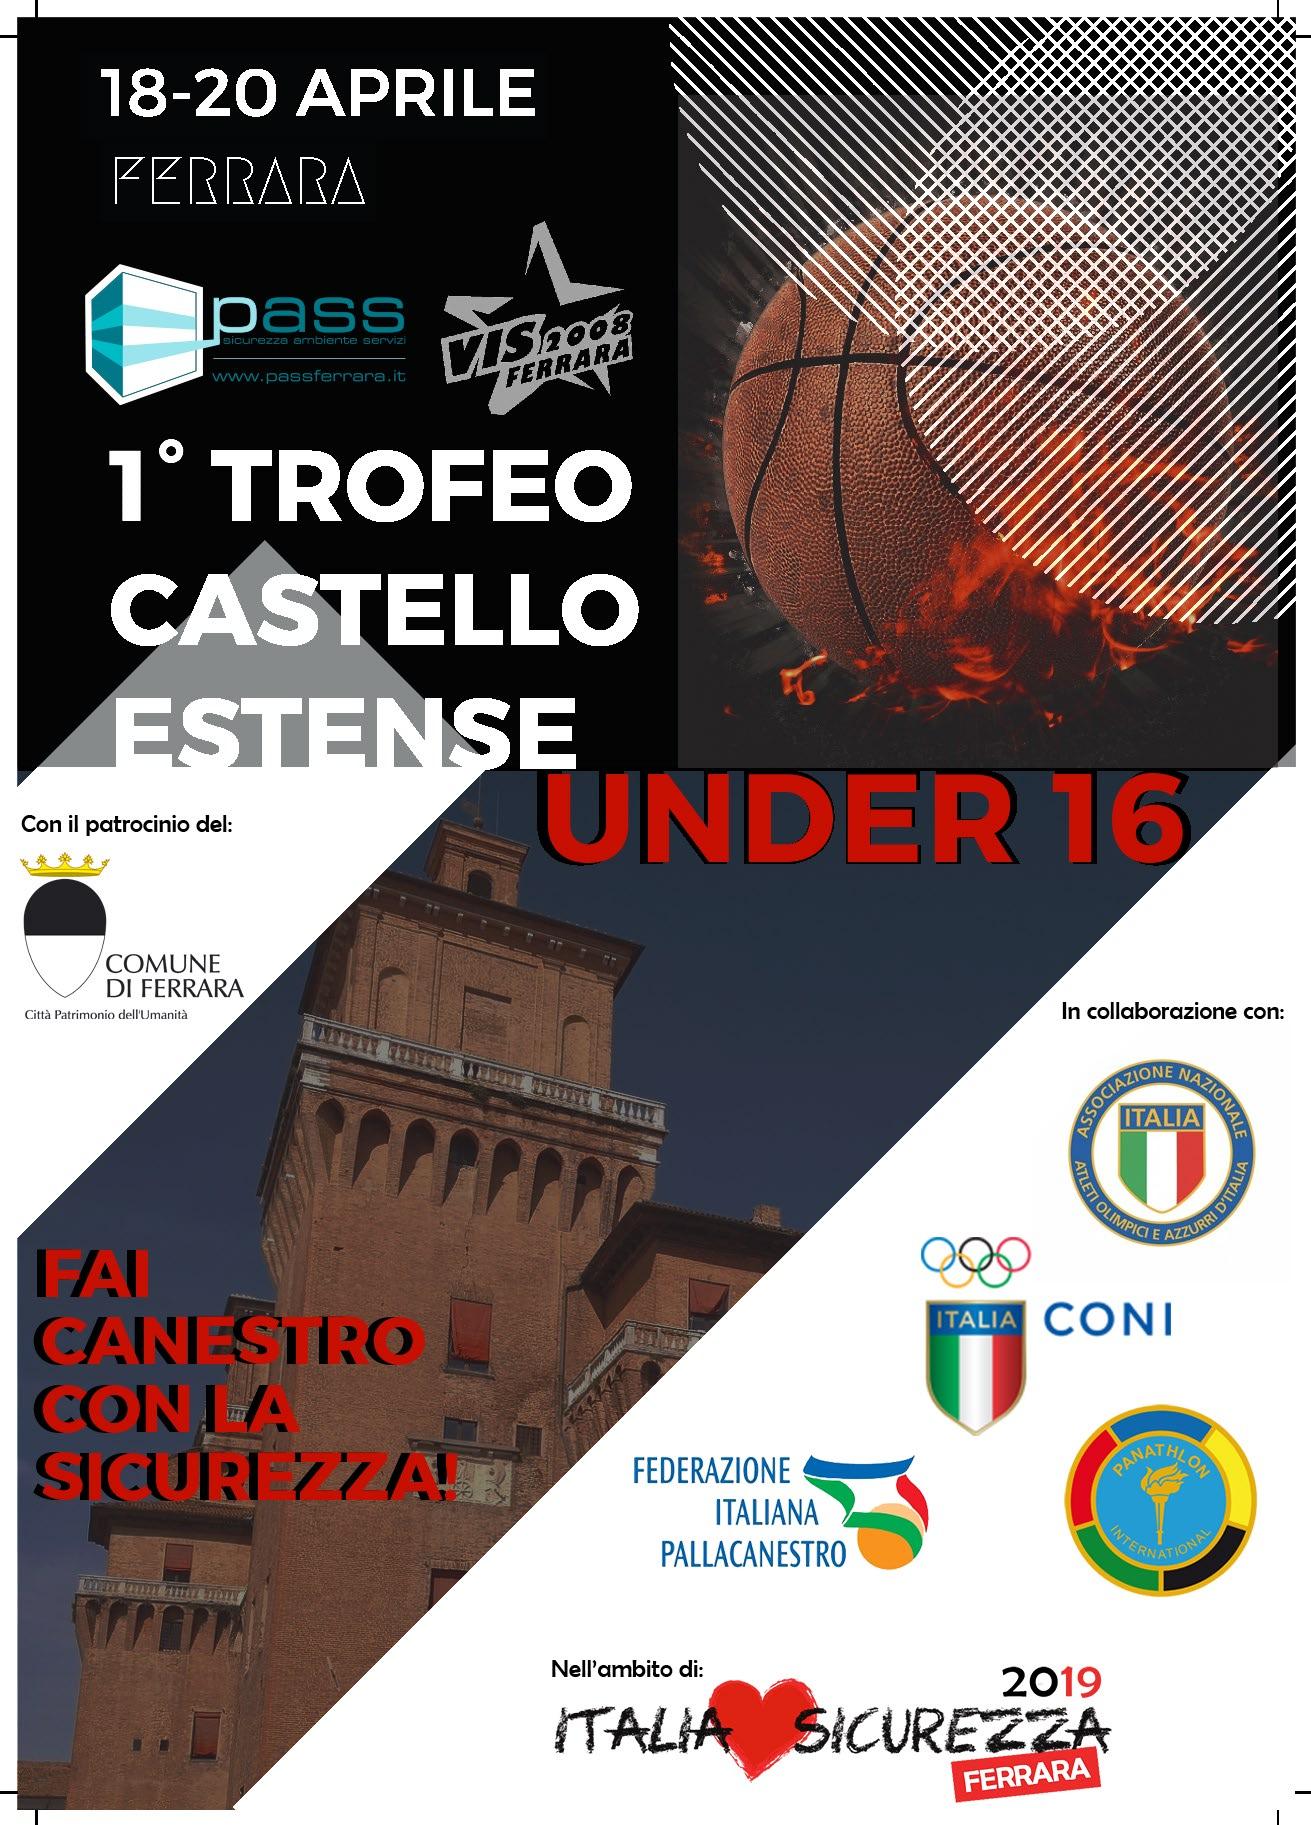 http://www.fondlhs.org/wp-content/uploads/2019/04/Manifesto-trofeo-estense.jpg